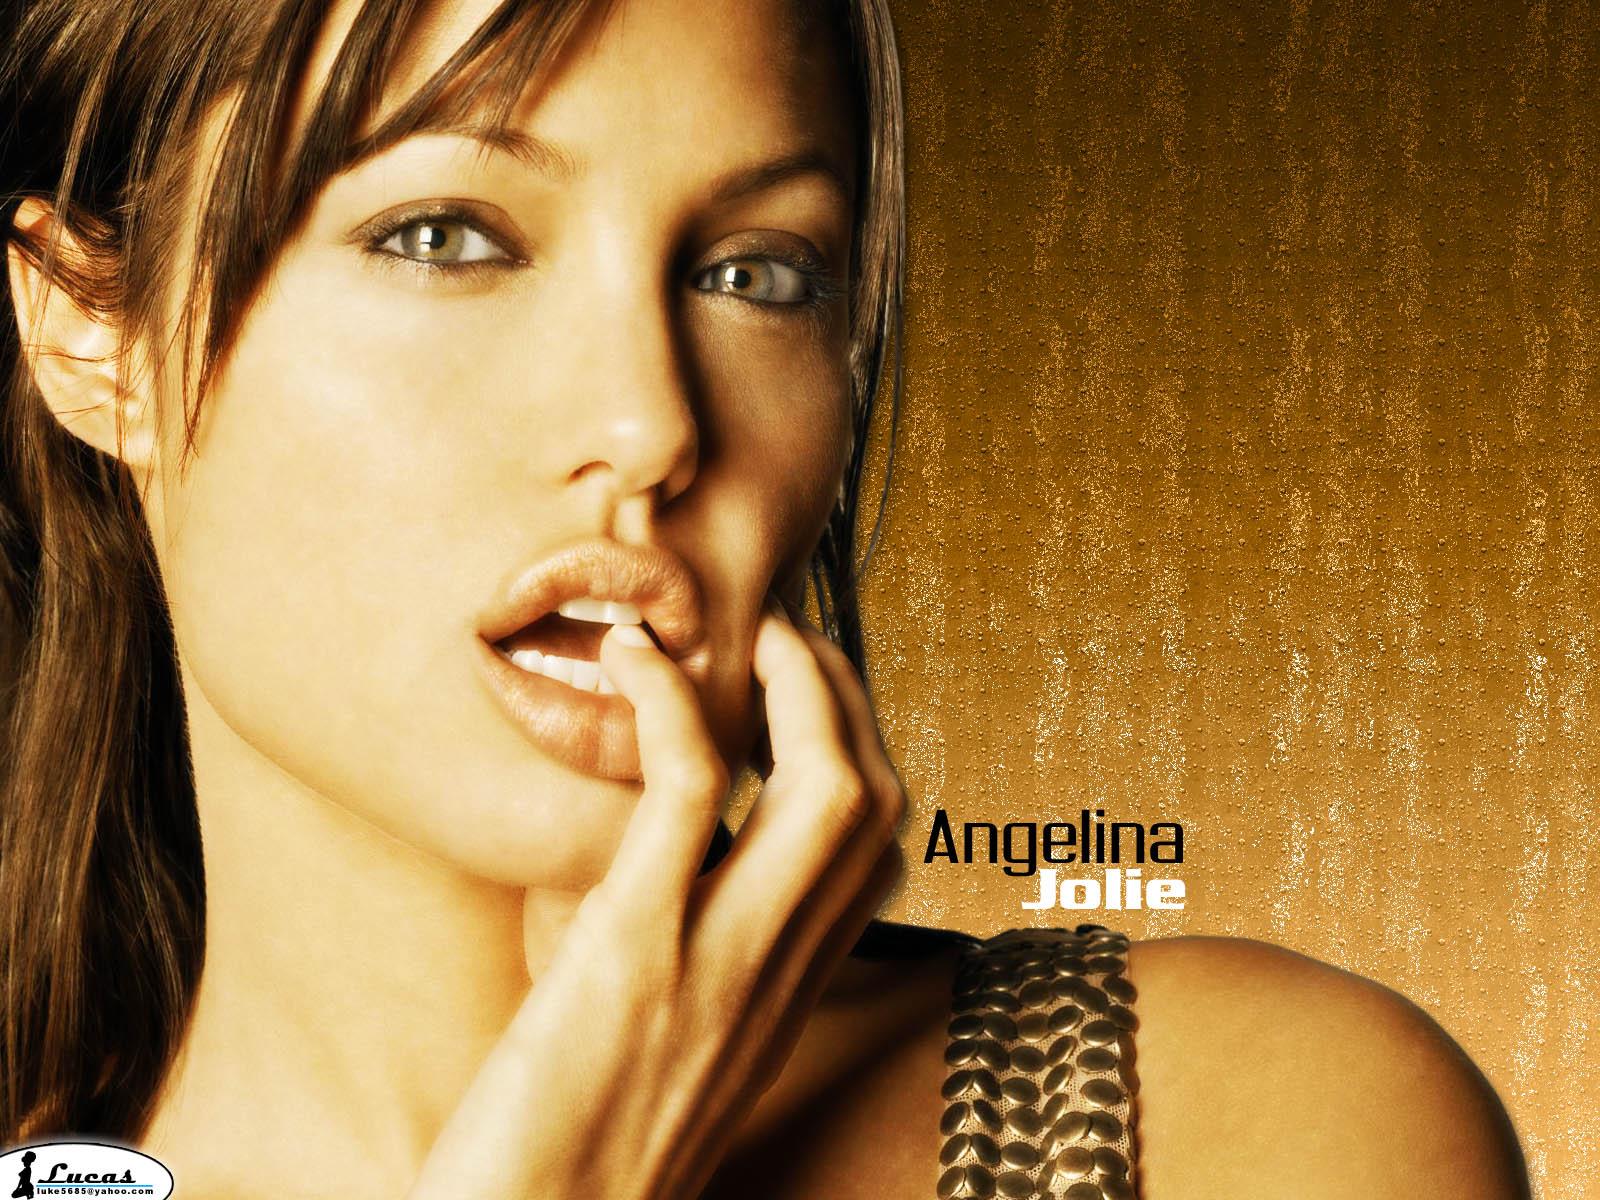 http://1.bp.blogspot.com/_8HO-BG8VKBE/TCFhXfT0K8I/AAAAAAAAOa4/ruJ-16FYzq0/s1600/angelina_jolie_94.jpg